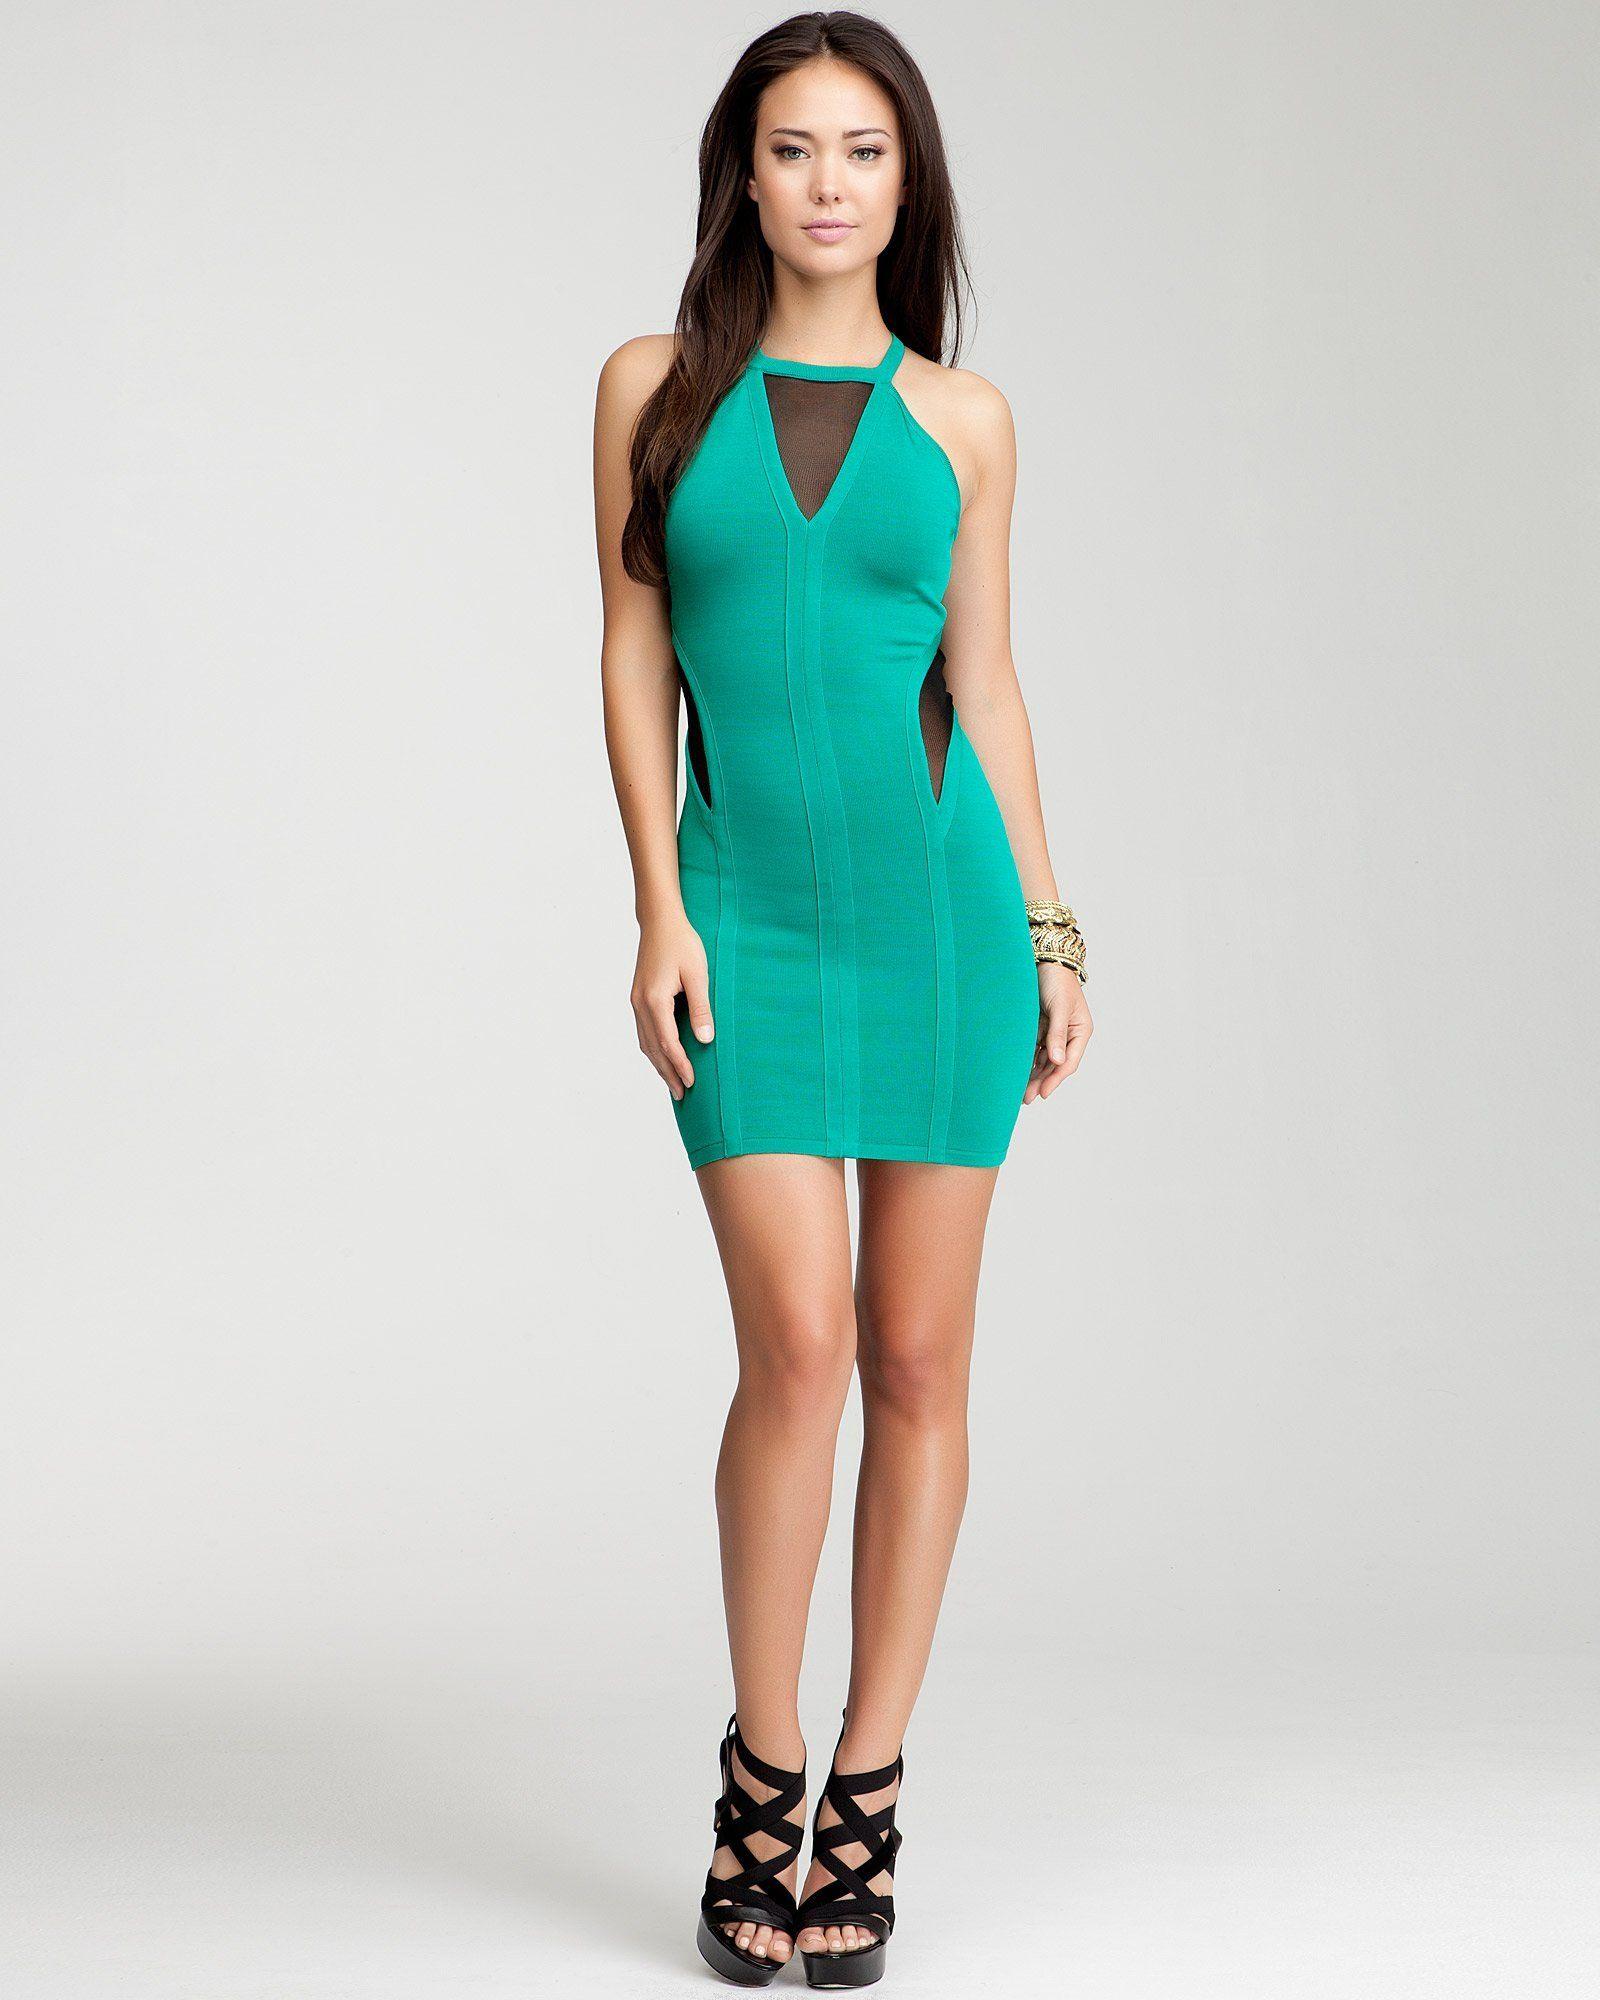 Bebe - Mesh Cutout Halter Dress - jungle green | My Style ...